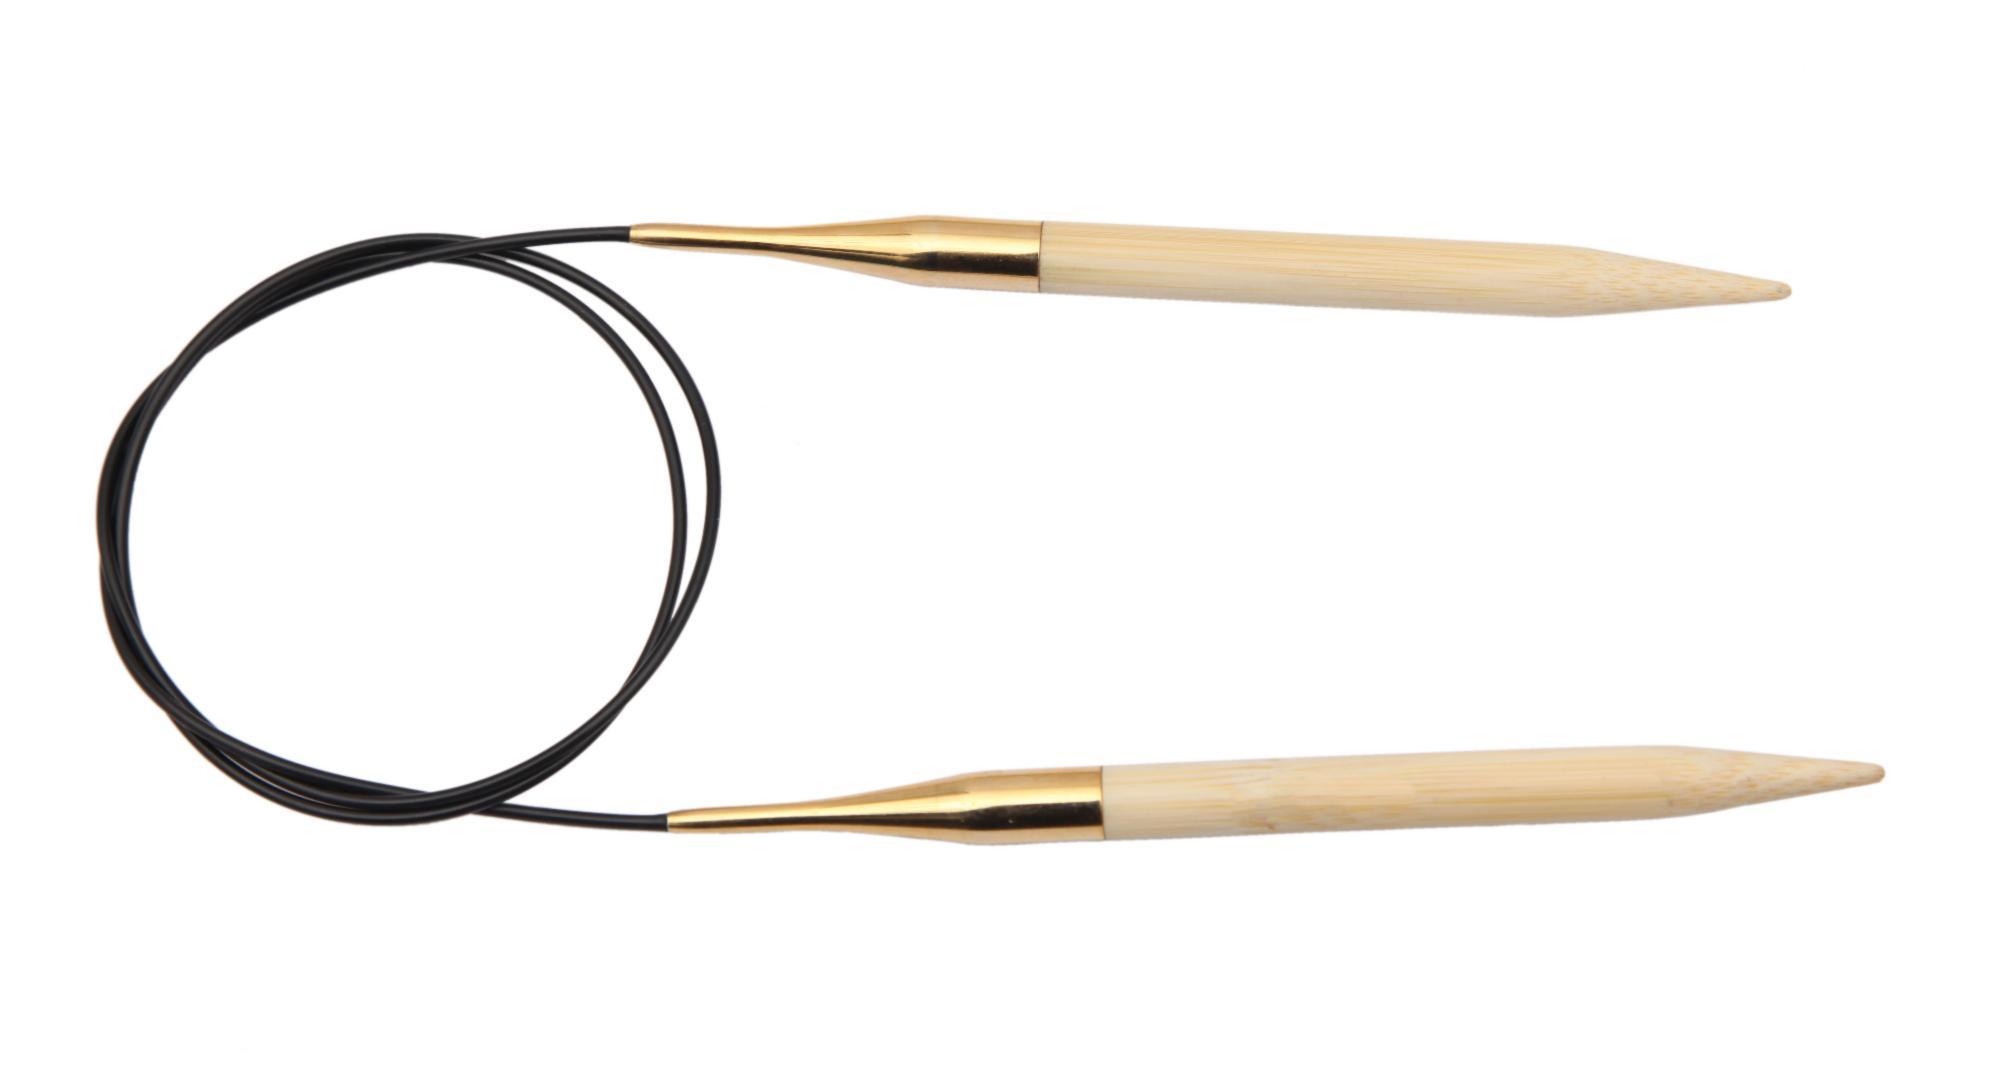 Спицы круговые 40 см Bamboo KnitPro, 22212, 6.50 мм